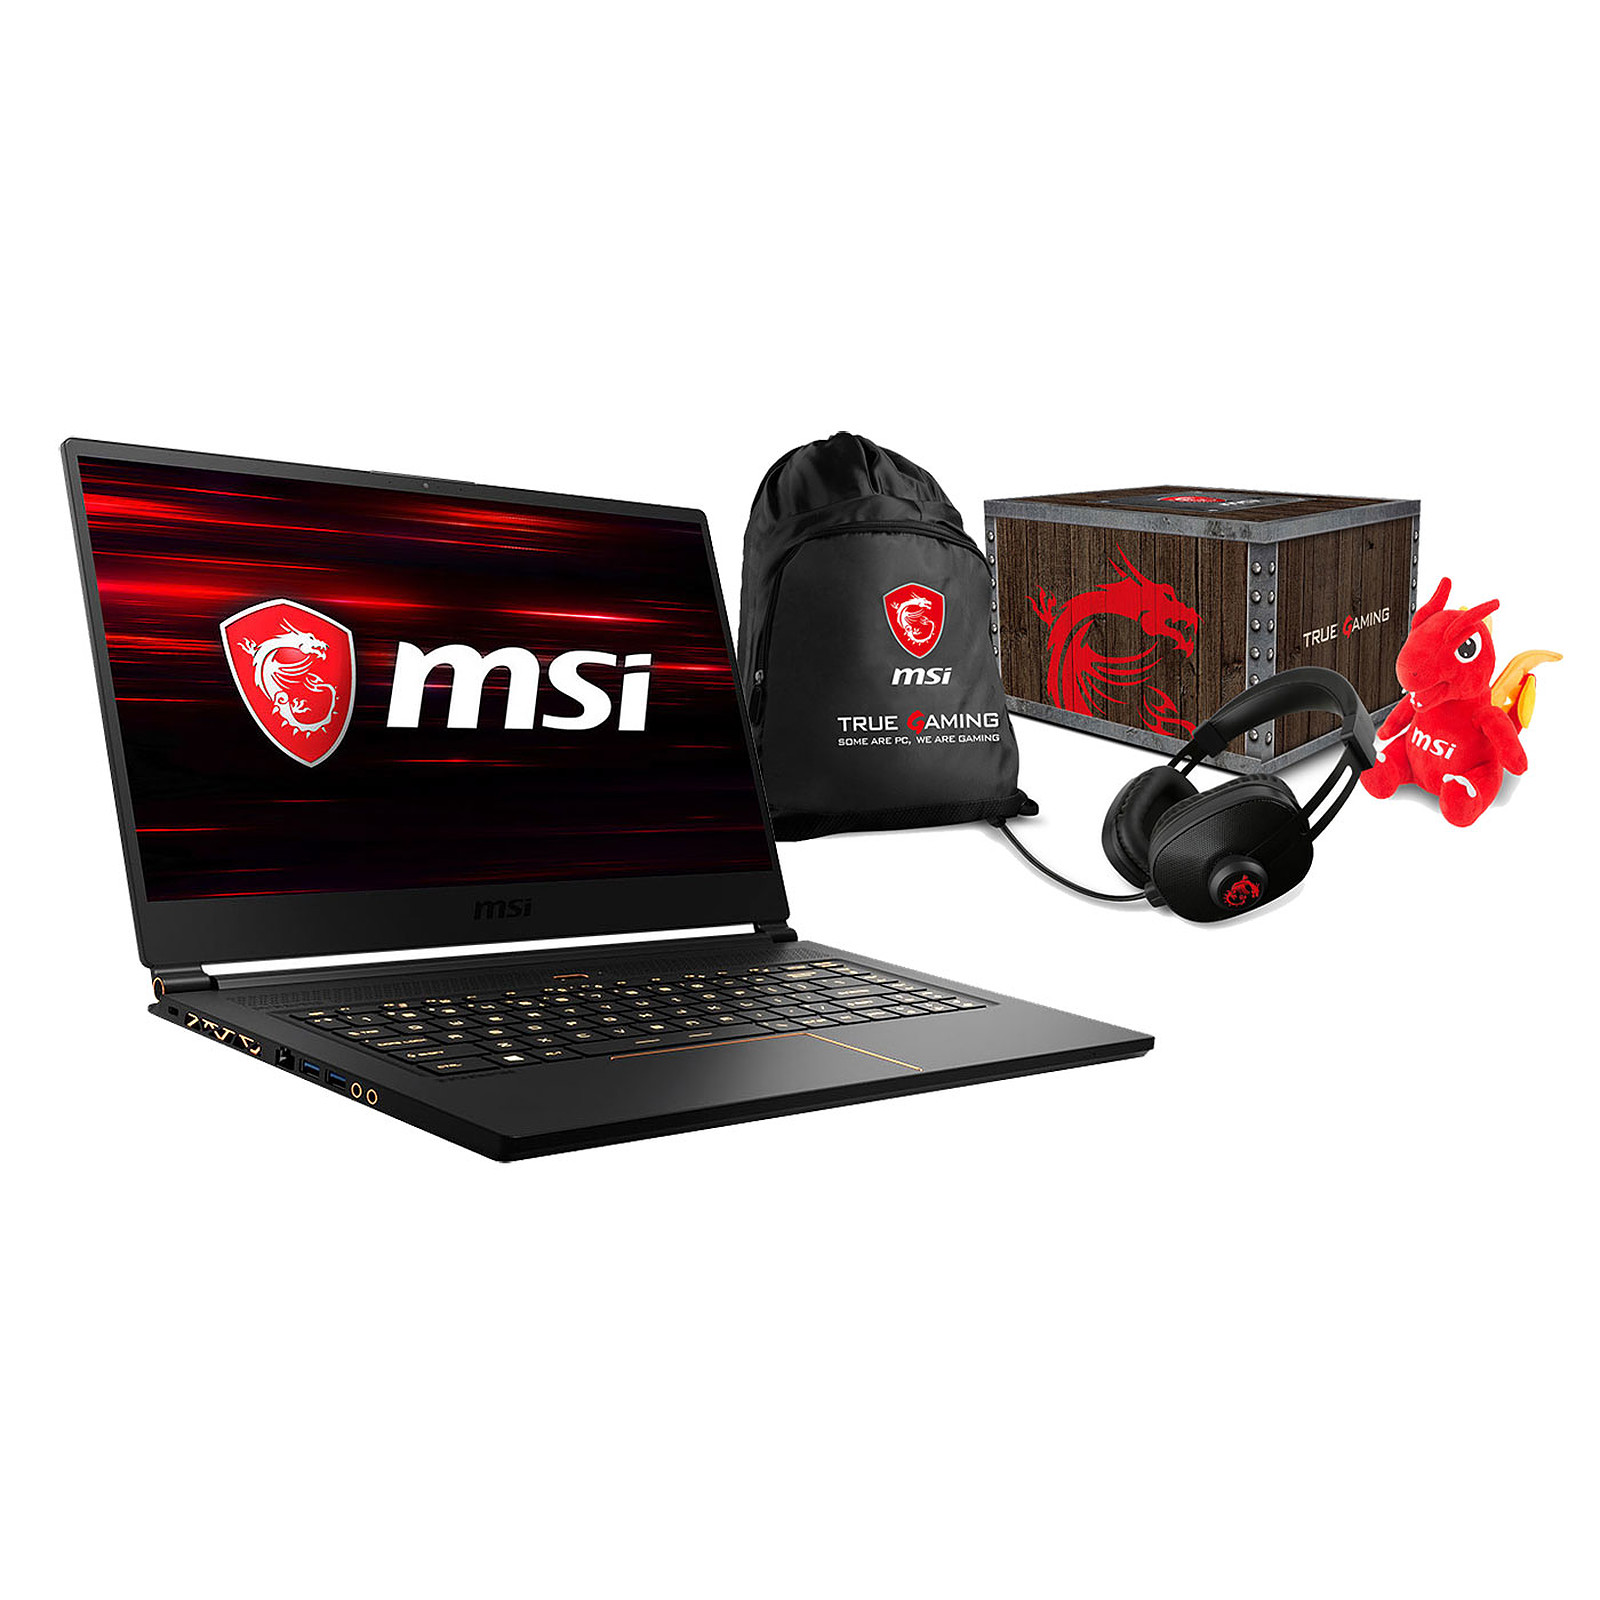 MSI GS65 8RF-049FR Stealth Thin + MSI Loot Box - Level 2 OFFERTE !